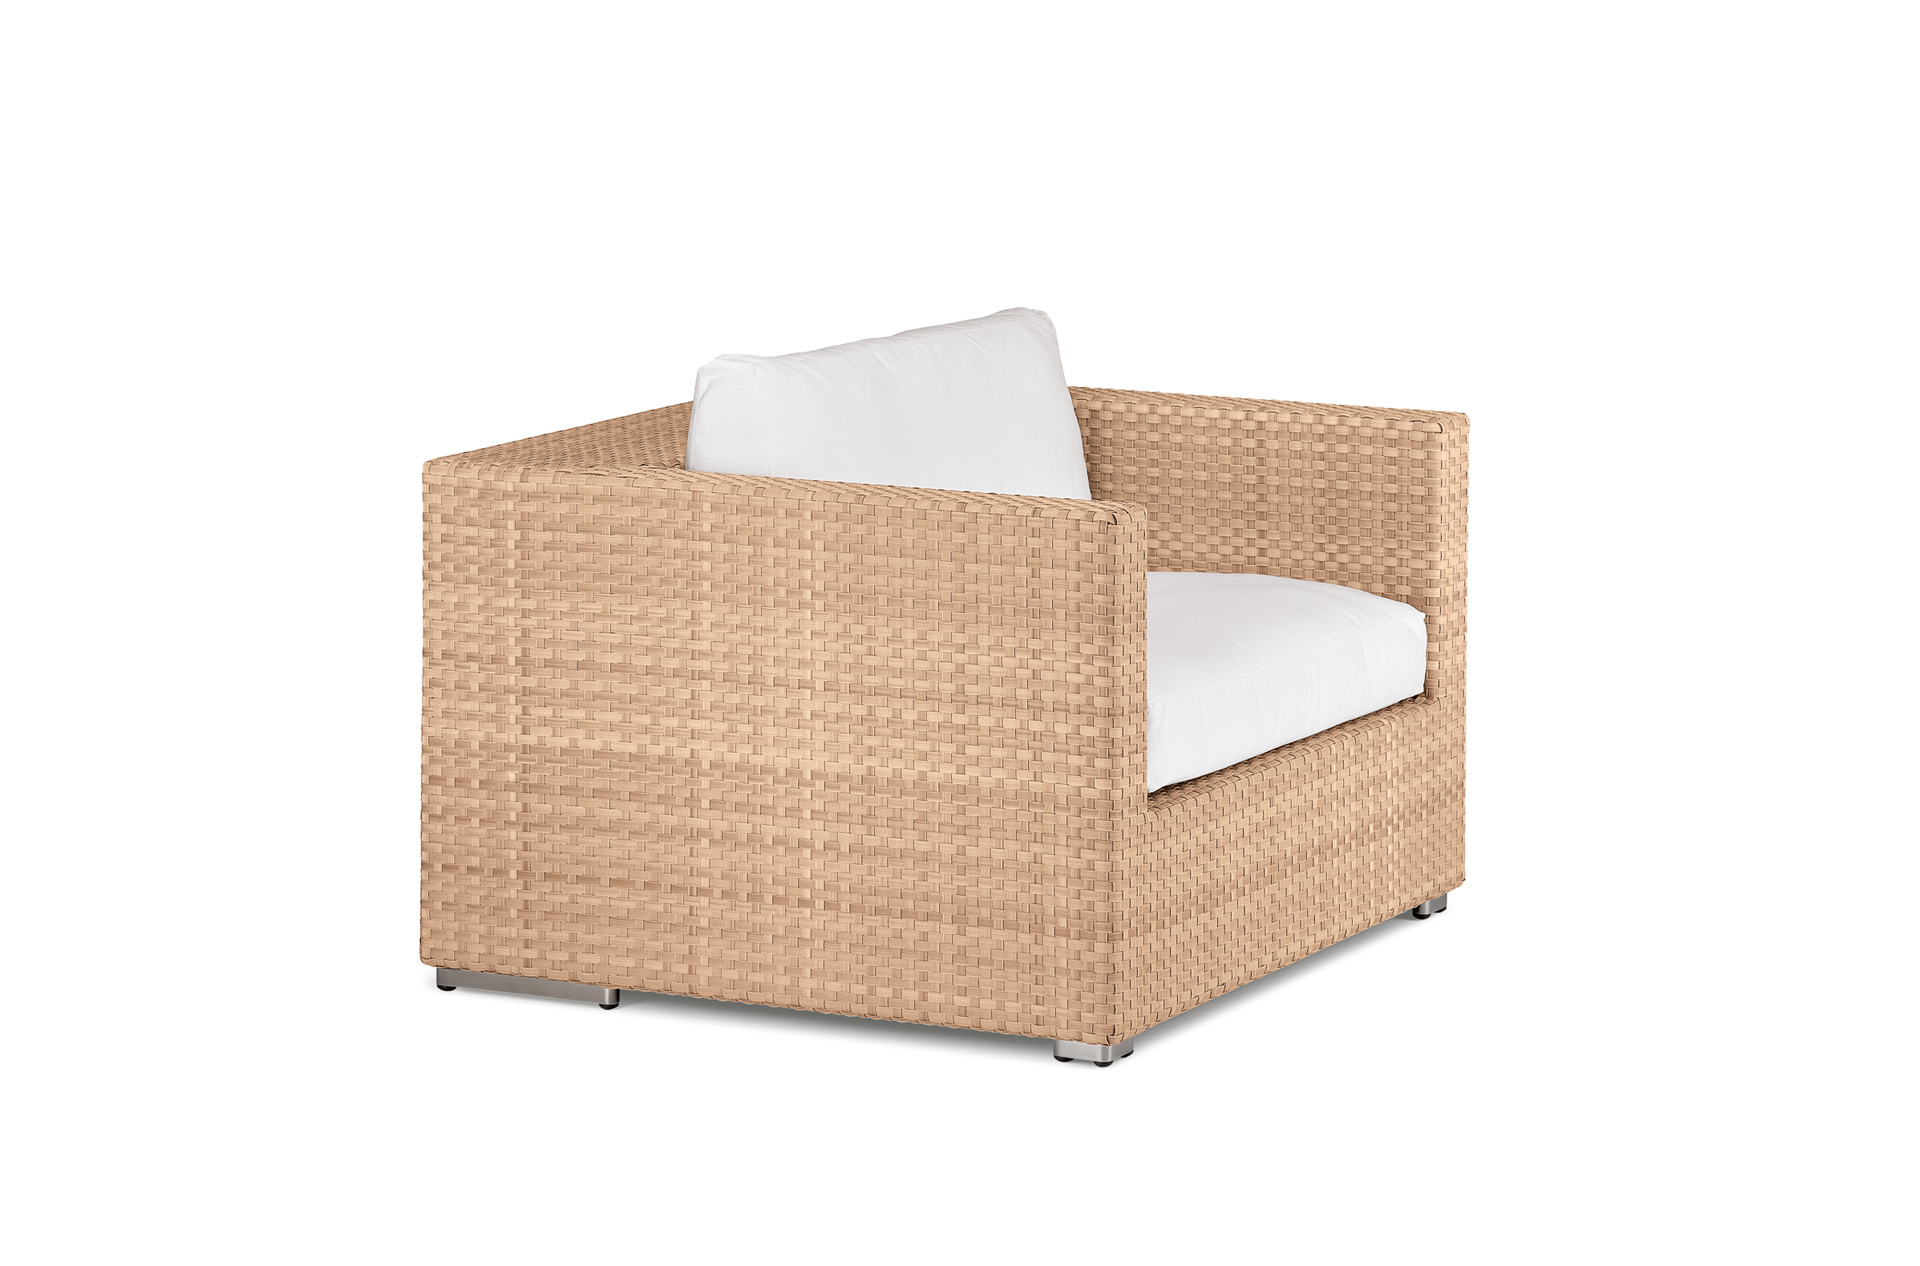 Brilliant Lounge Lounge Chair By Dedon Stylepark Machost Co Dining Chair Design Ideas Machostcouk